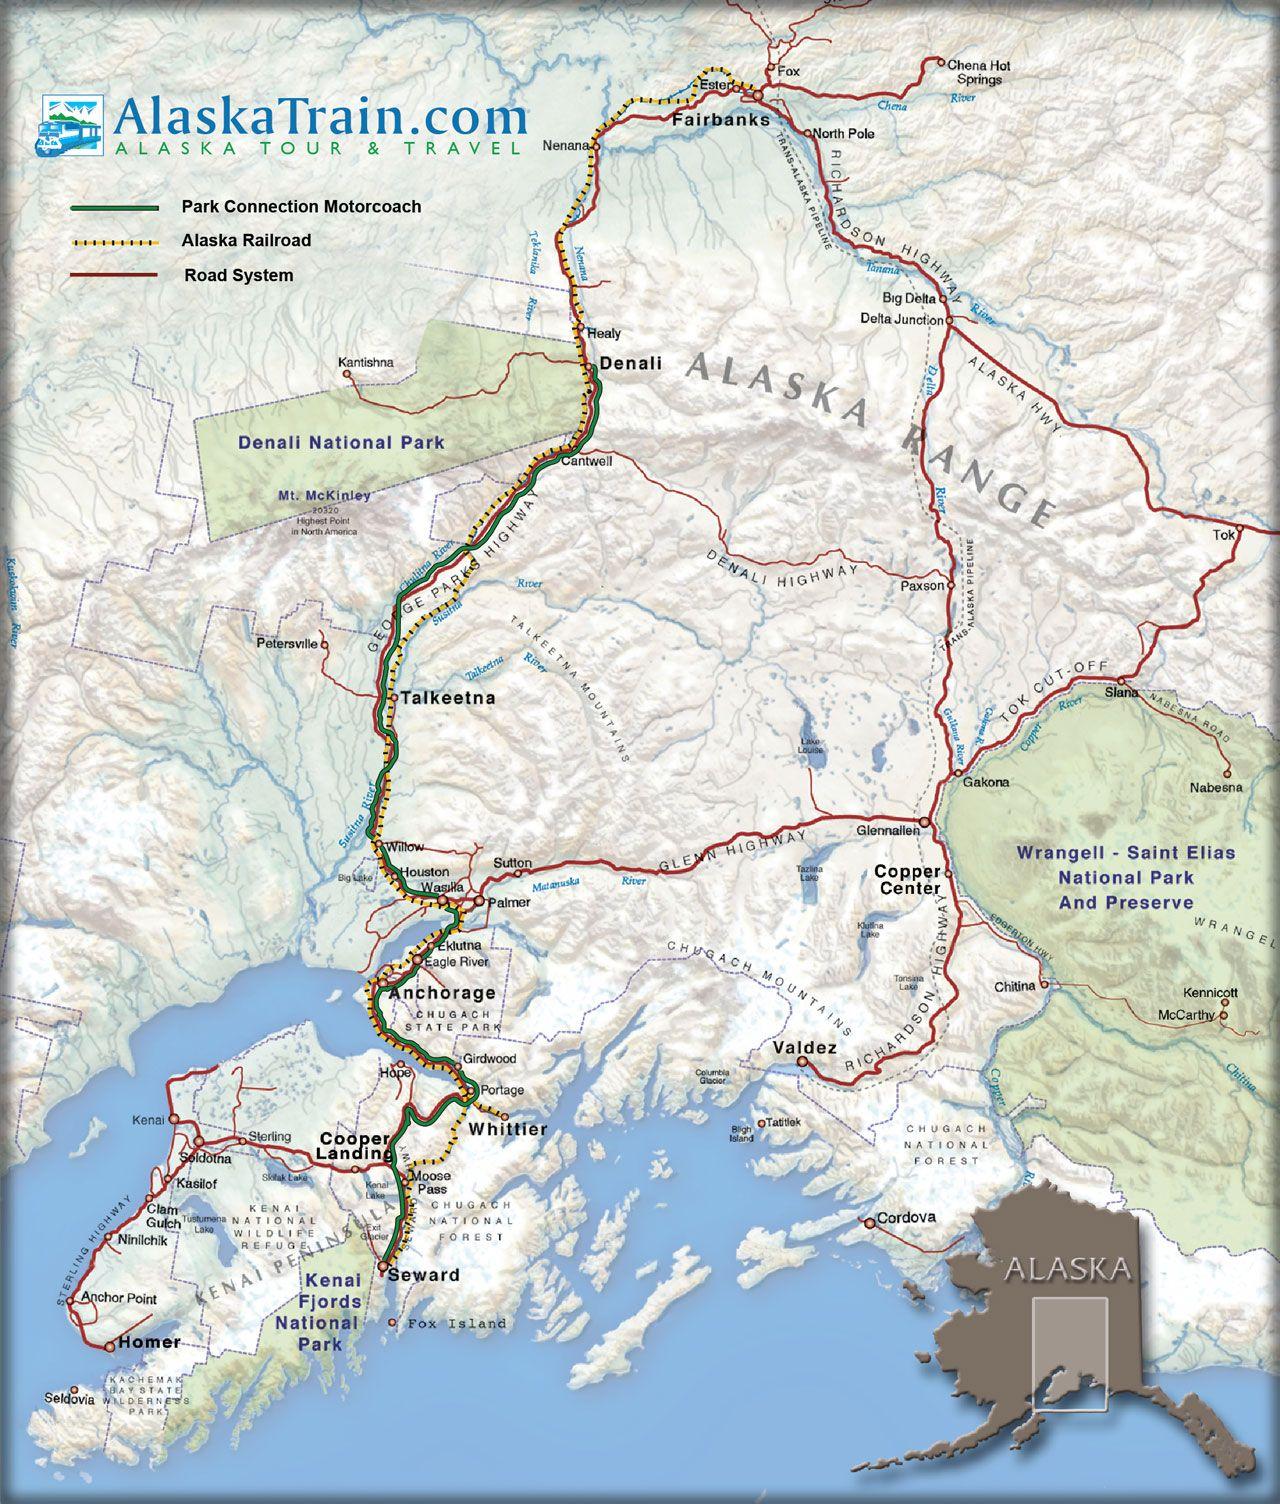 Alaska Train Map   Alaska   Pinterest   Alaska train, Train map and ...